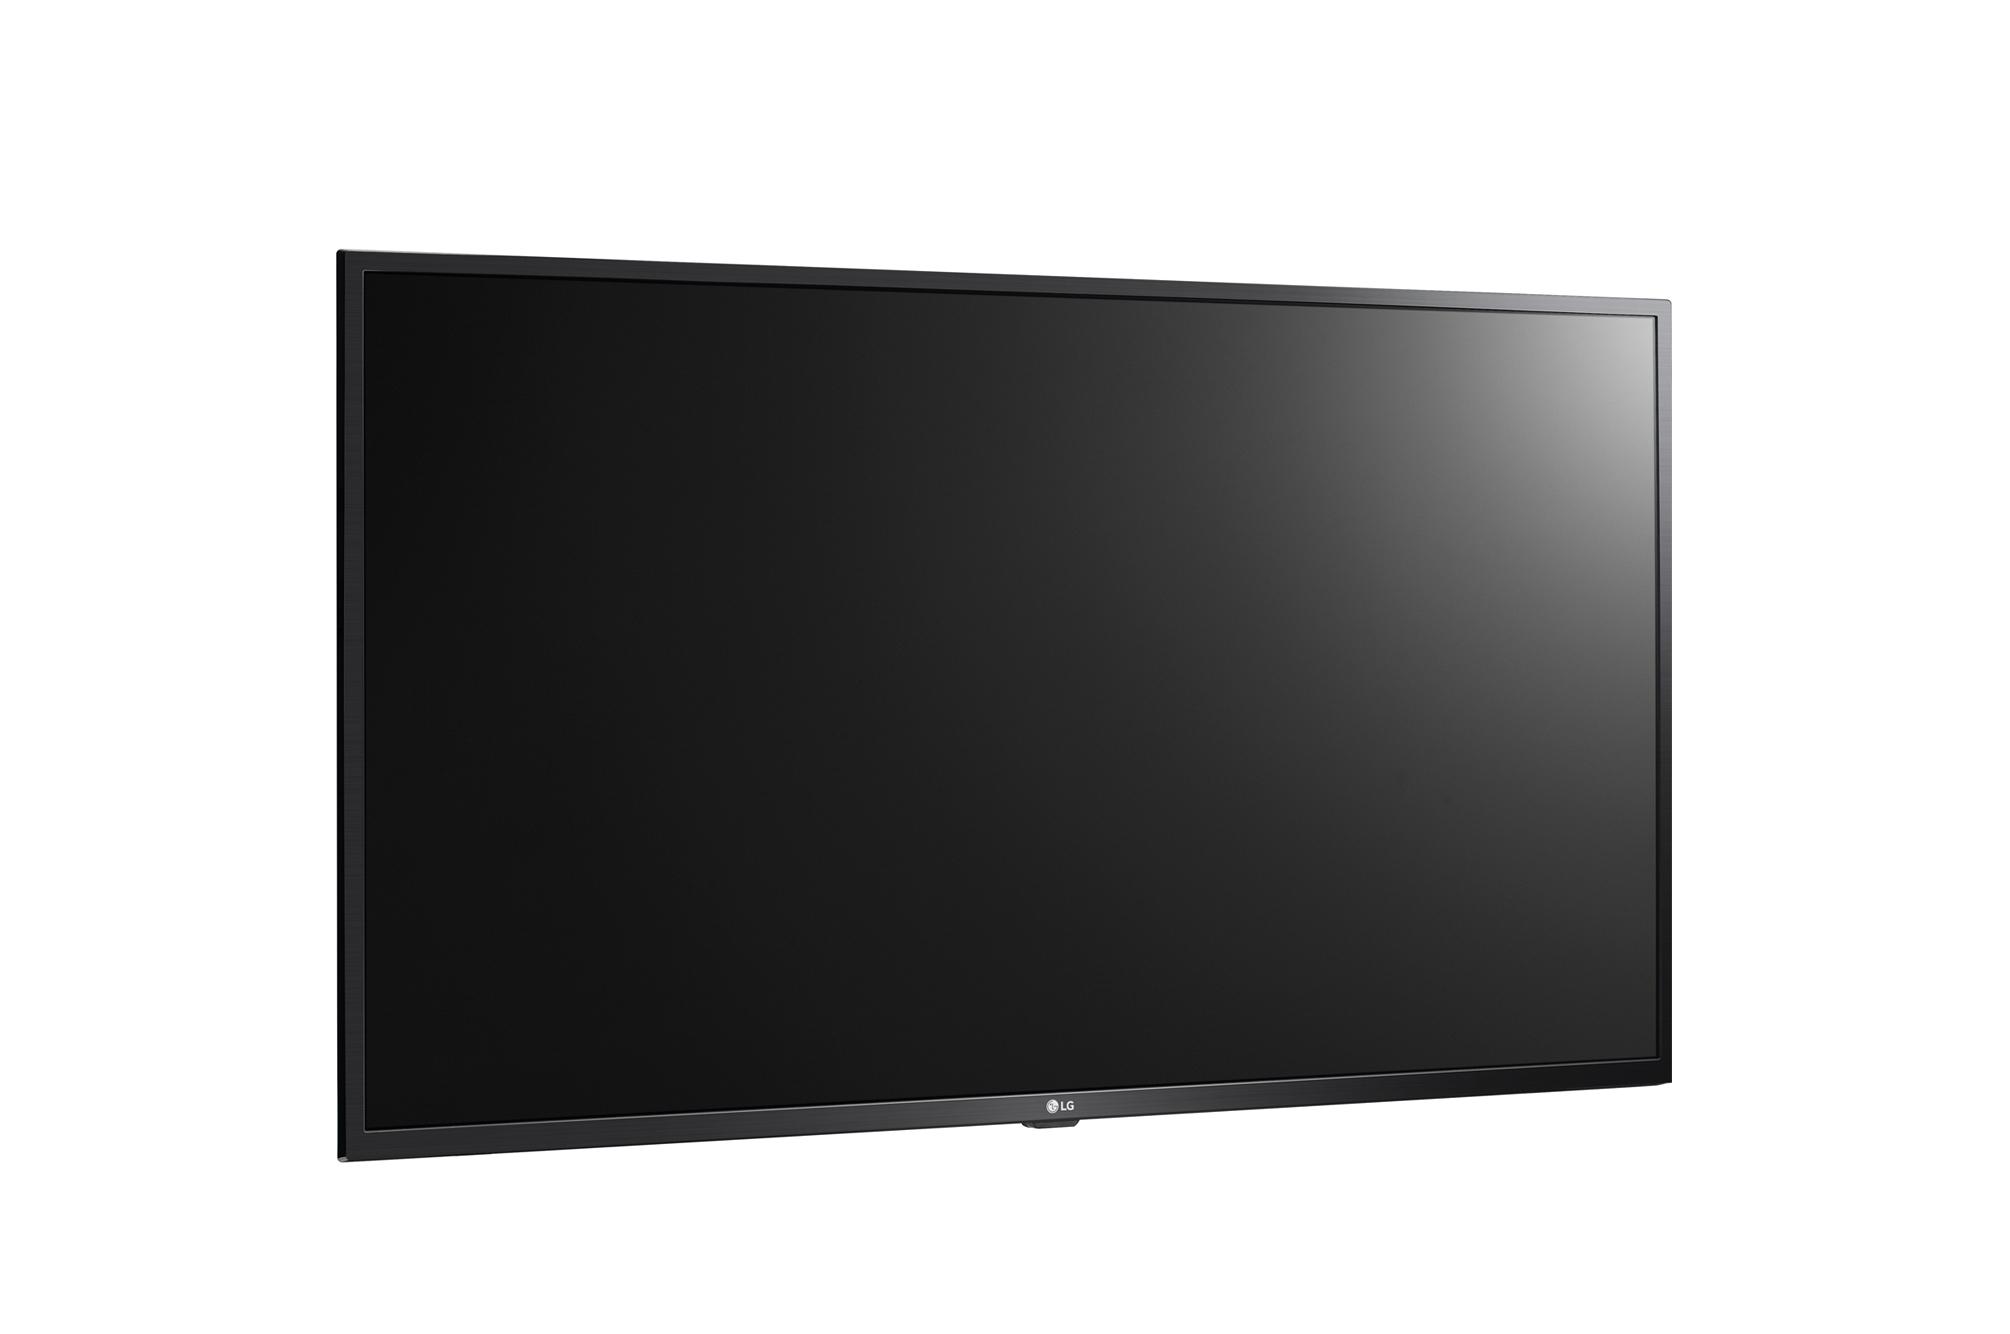 LG Hotel TV 50US662H (CIS) 7